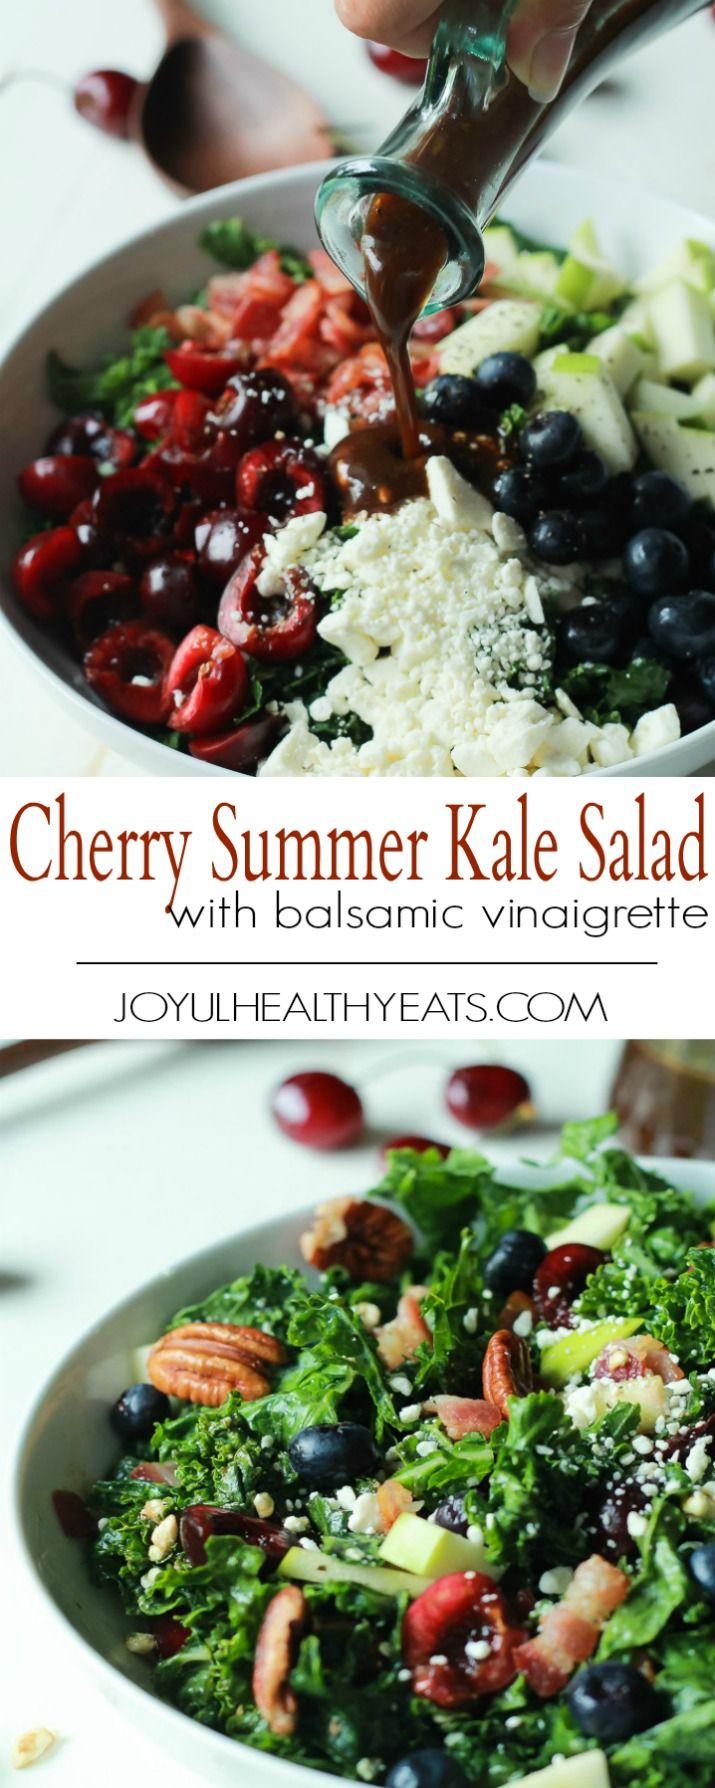 Cherry Summer Kale Salad with Balsamic Vinaigrette